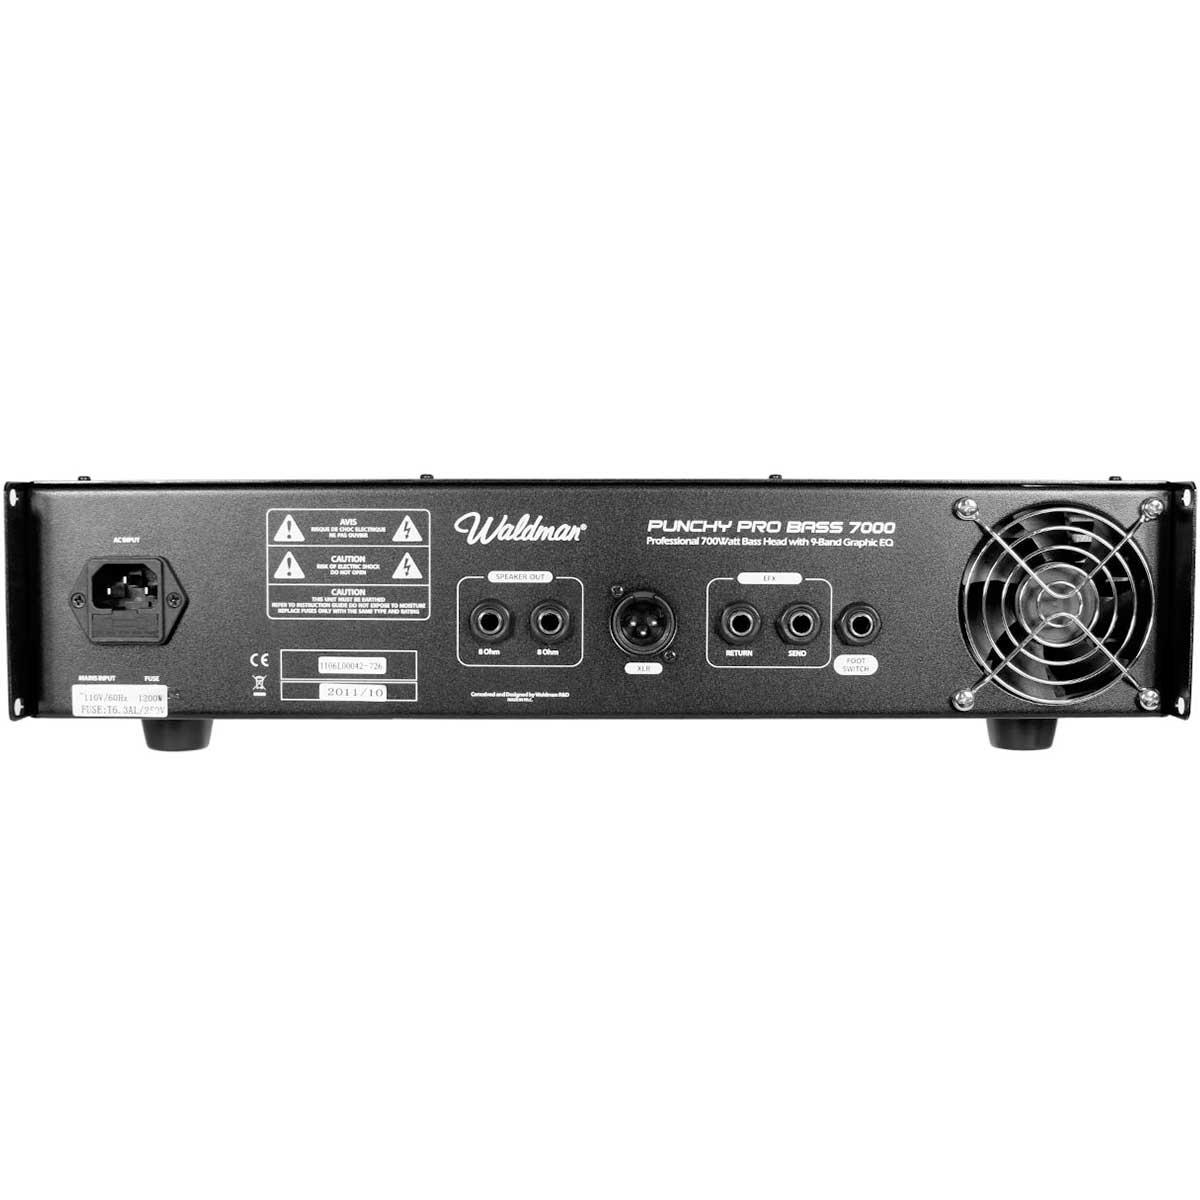 PPB7000 - Cabeçote p/ Contrabaixo Punchy Pro Bass PPB 7000 - Waldman